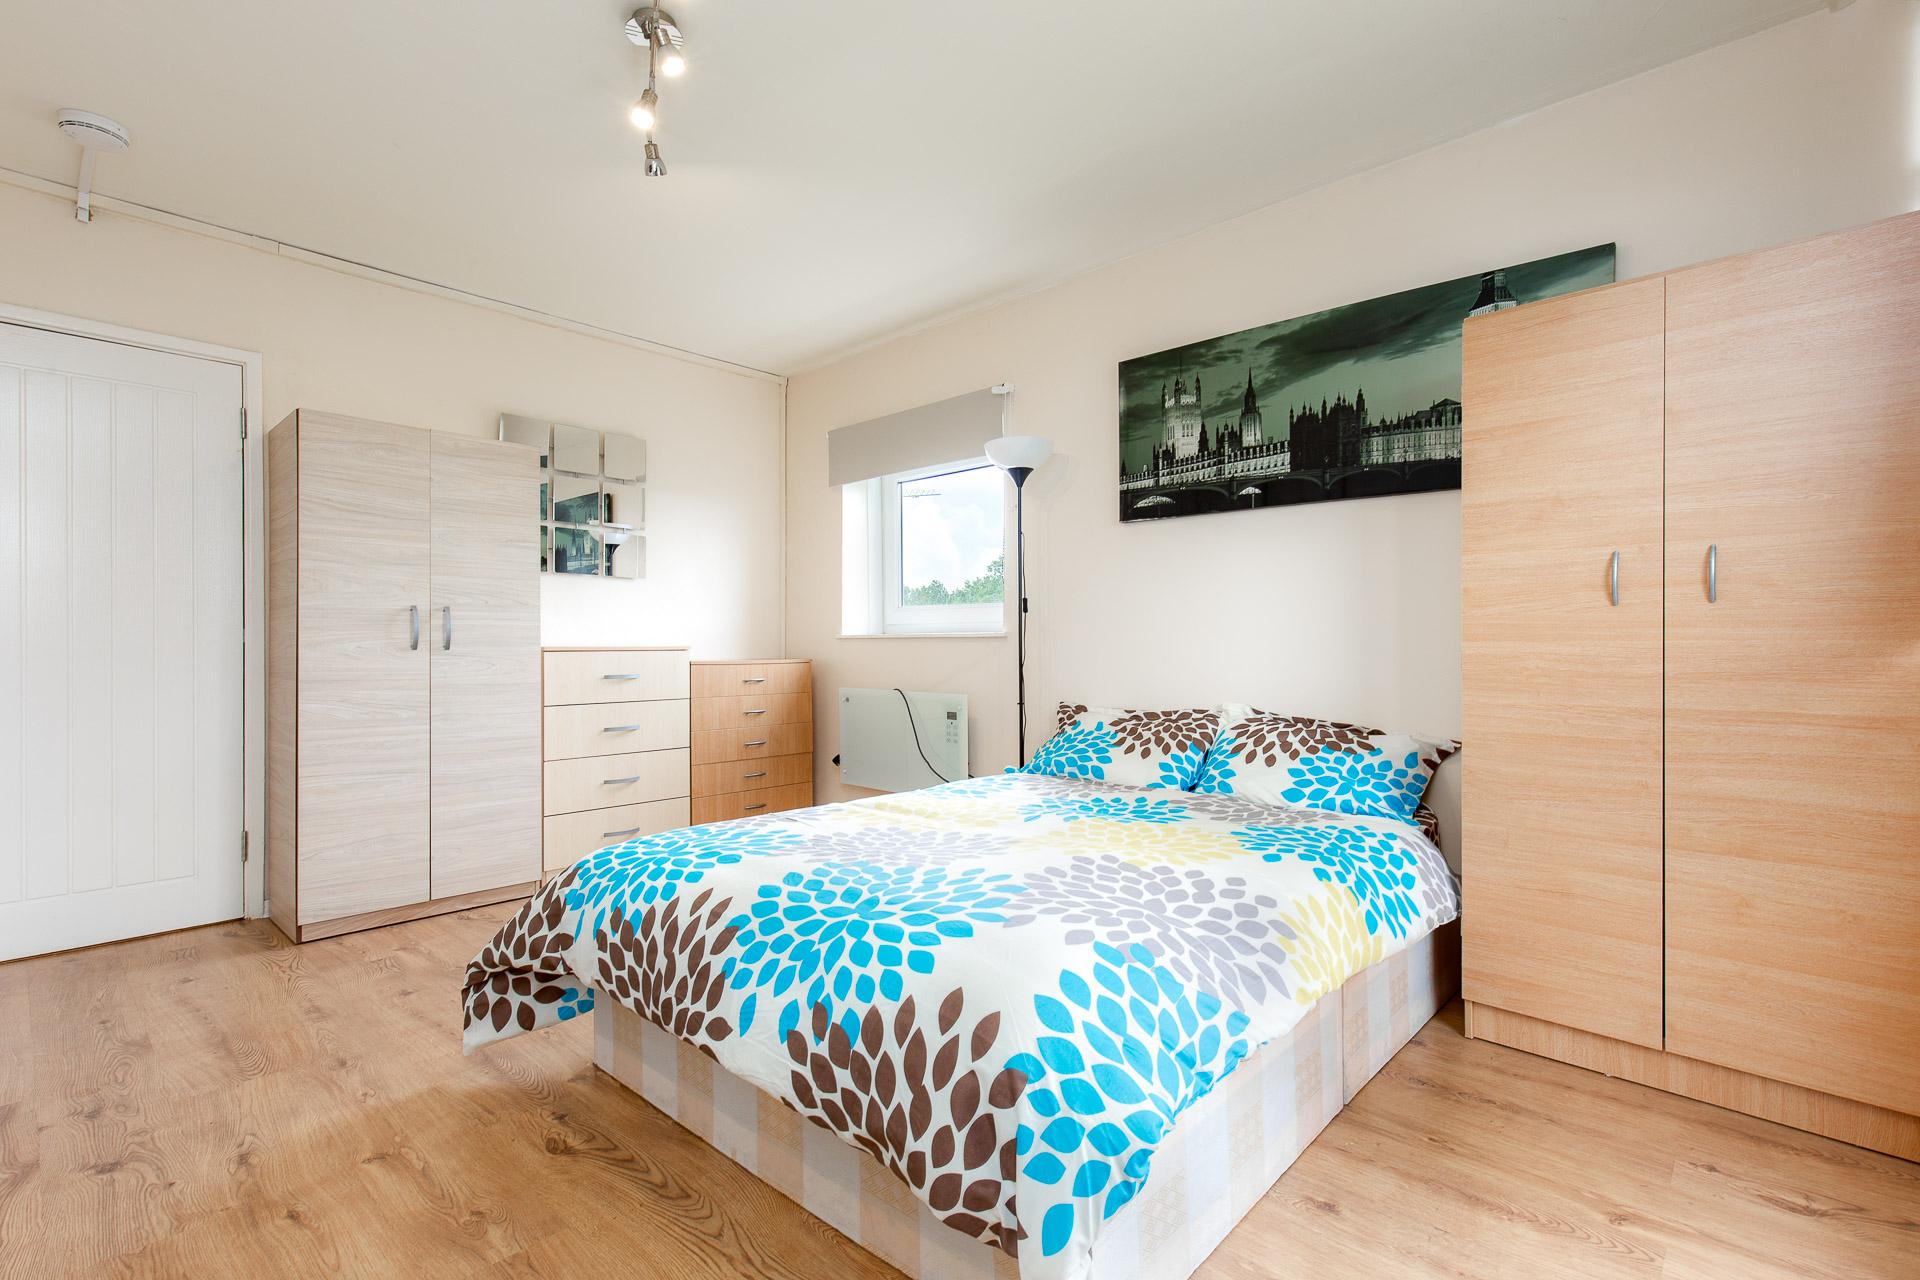 Queensland House London Deluxe Guest Room 3 photo 20449784